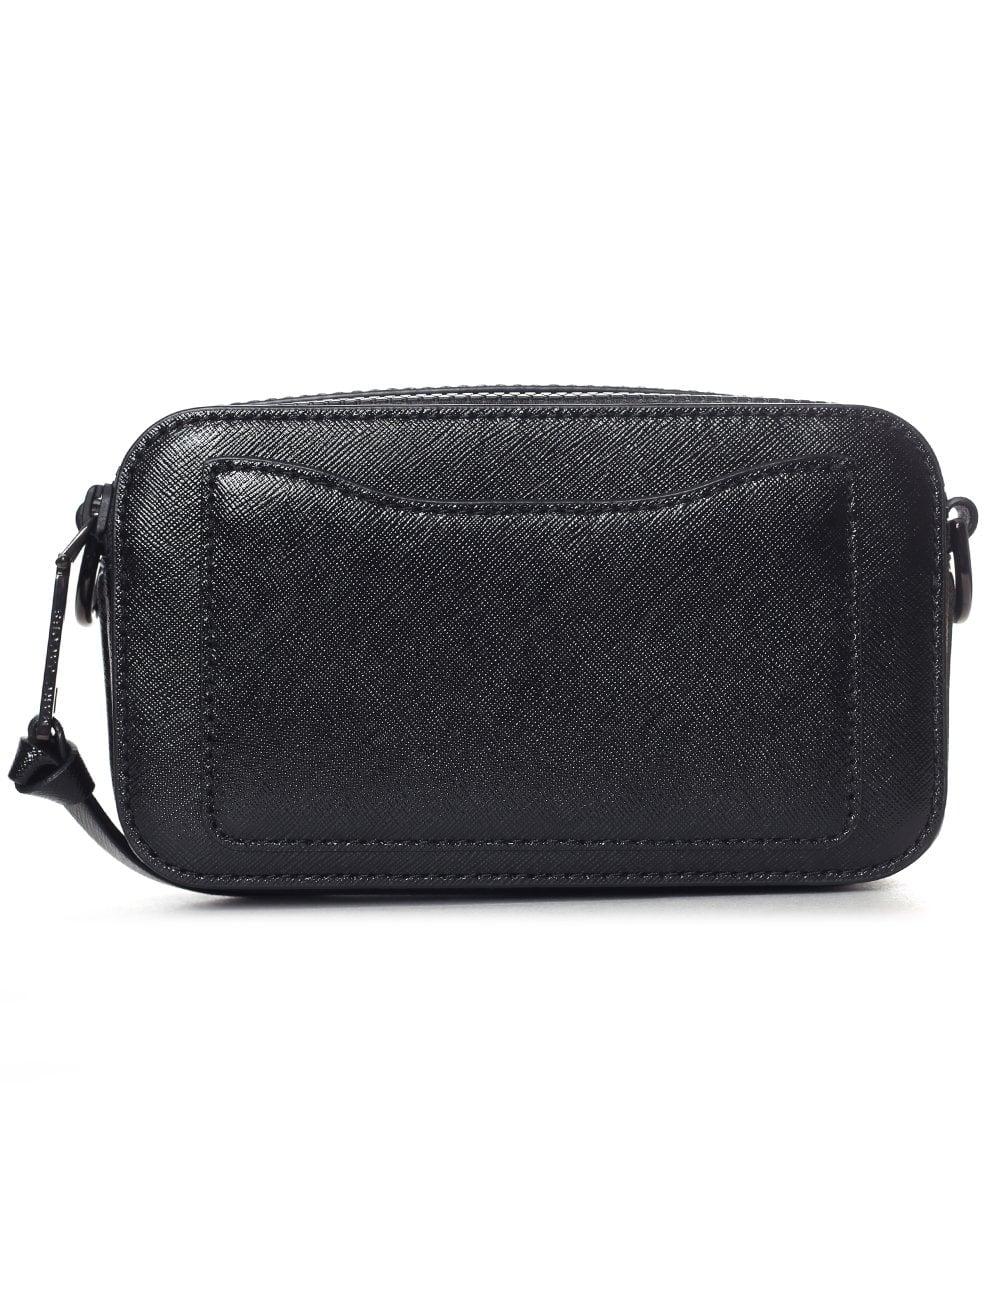 16faf5cc10 Marc Jacobs Women's Snapshot Small Camera Bag Black